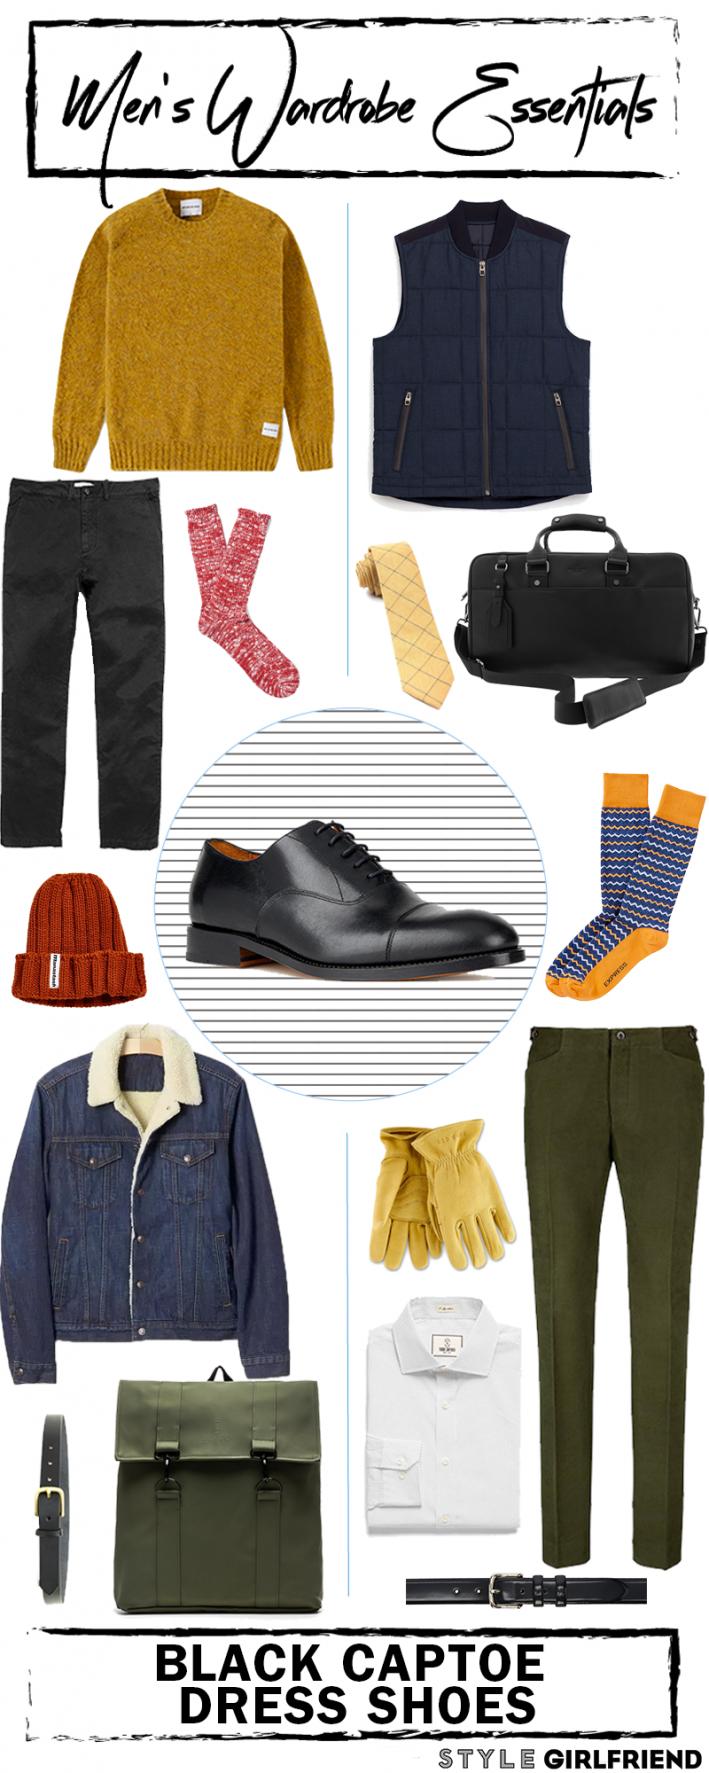 mens wardrobe essentials, menswear laydown, black captoe shoes,